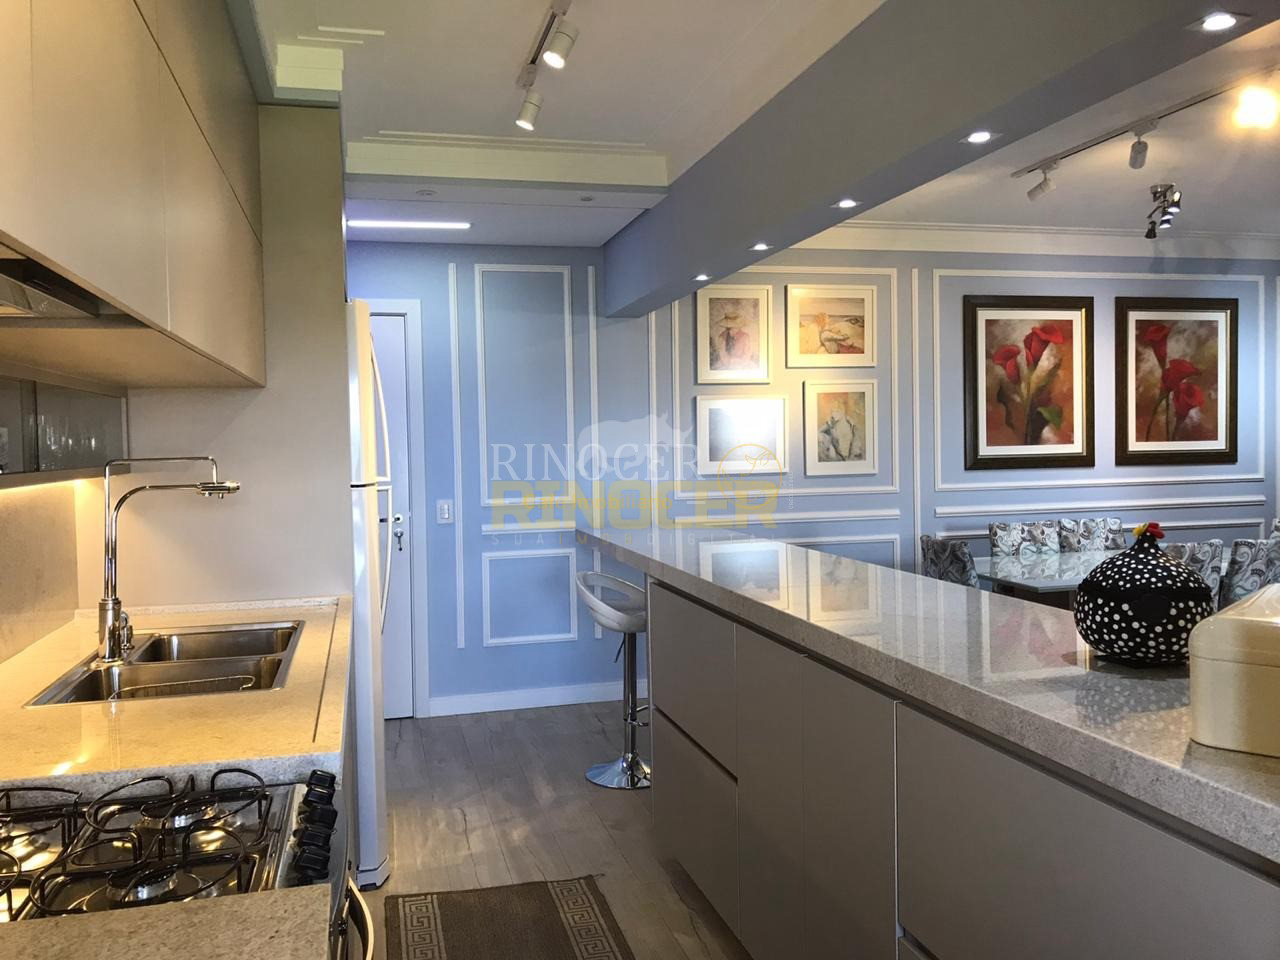 https://static.arboimoveis.com.br/AP0388_RNCR/apartamento-a-venda-quinta-da-primavera-ribeirao-preto1624524241522wurco_watermark.jpg